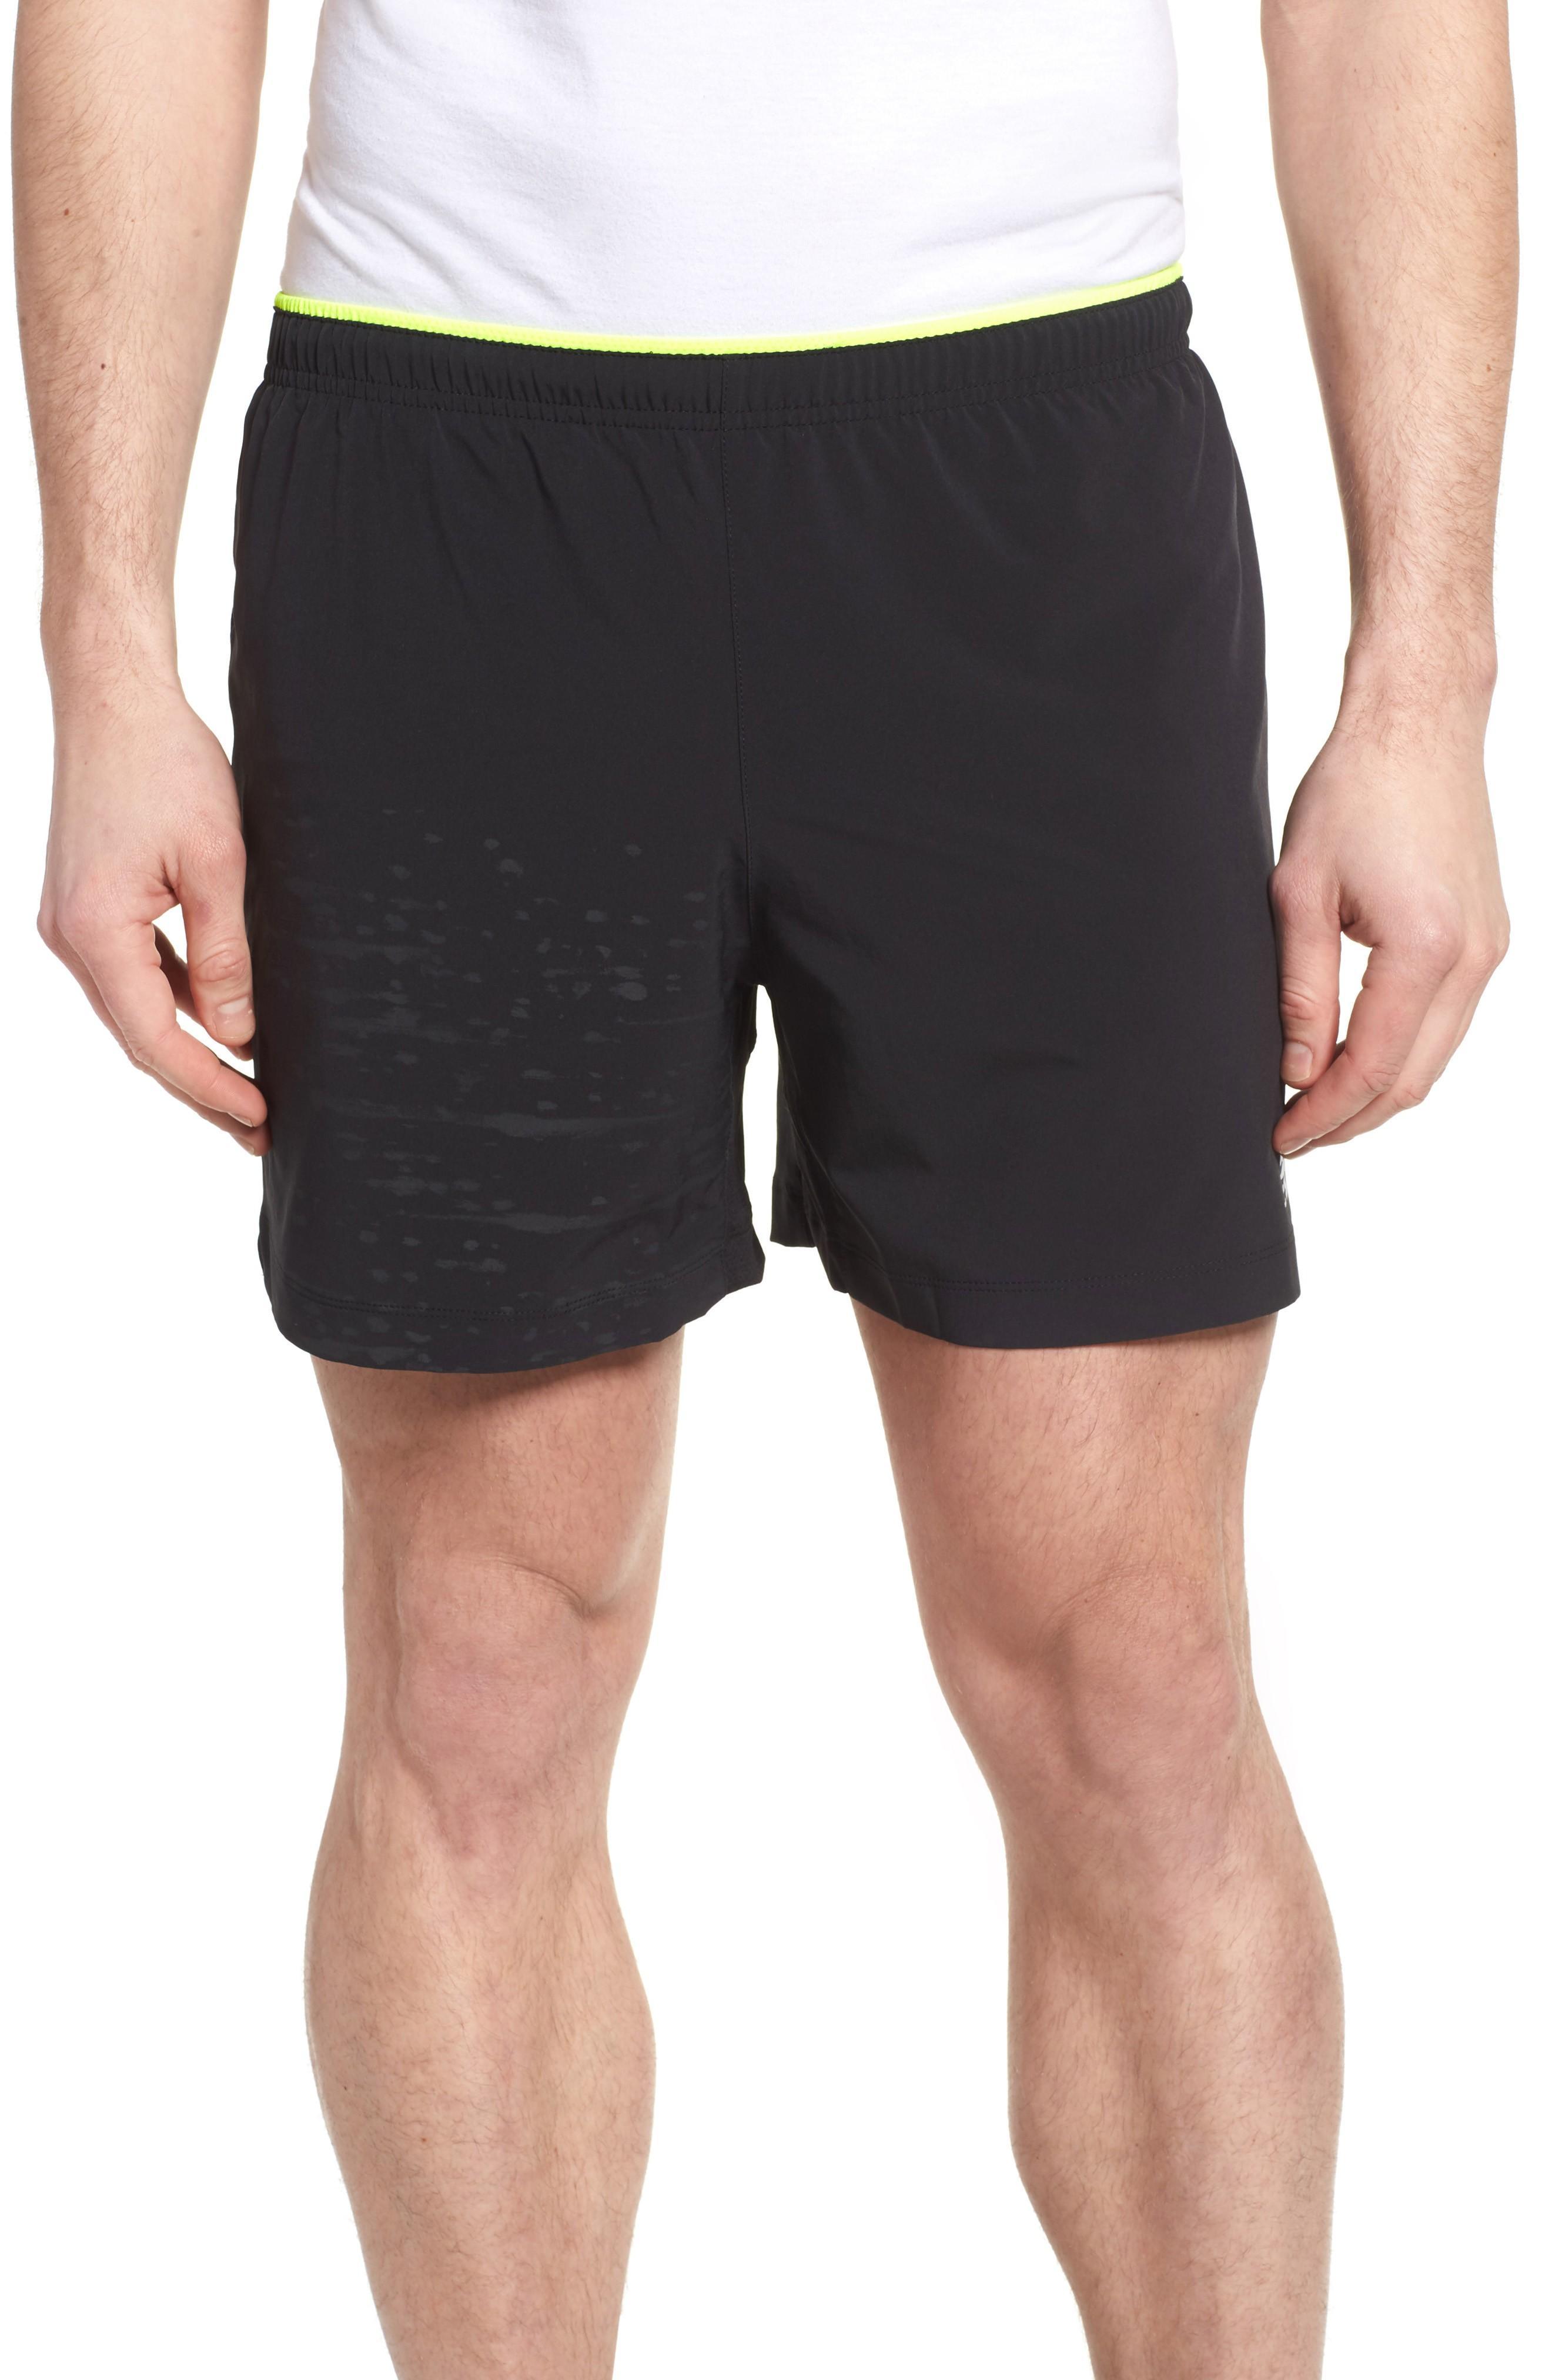 New Balance Impact Shorts In Black Multi